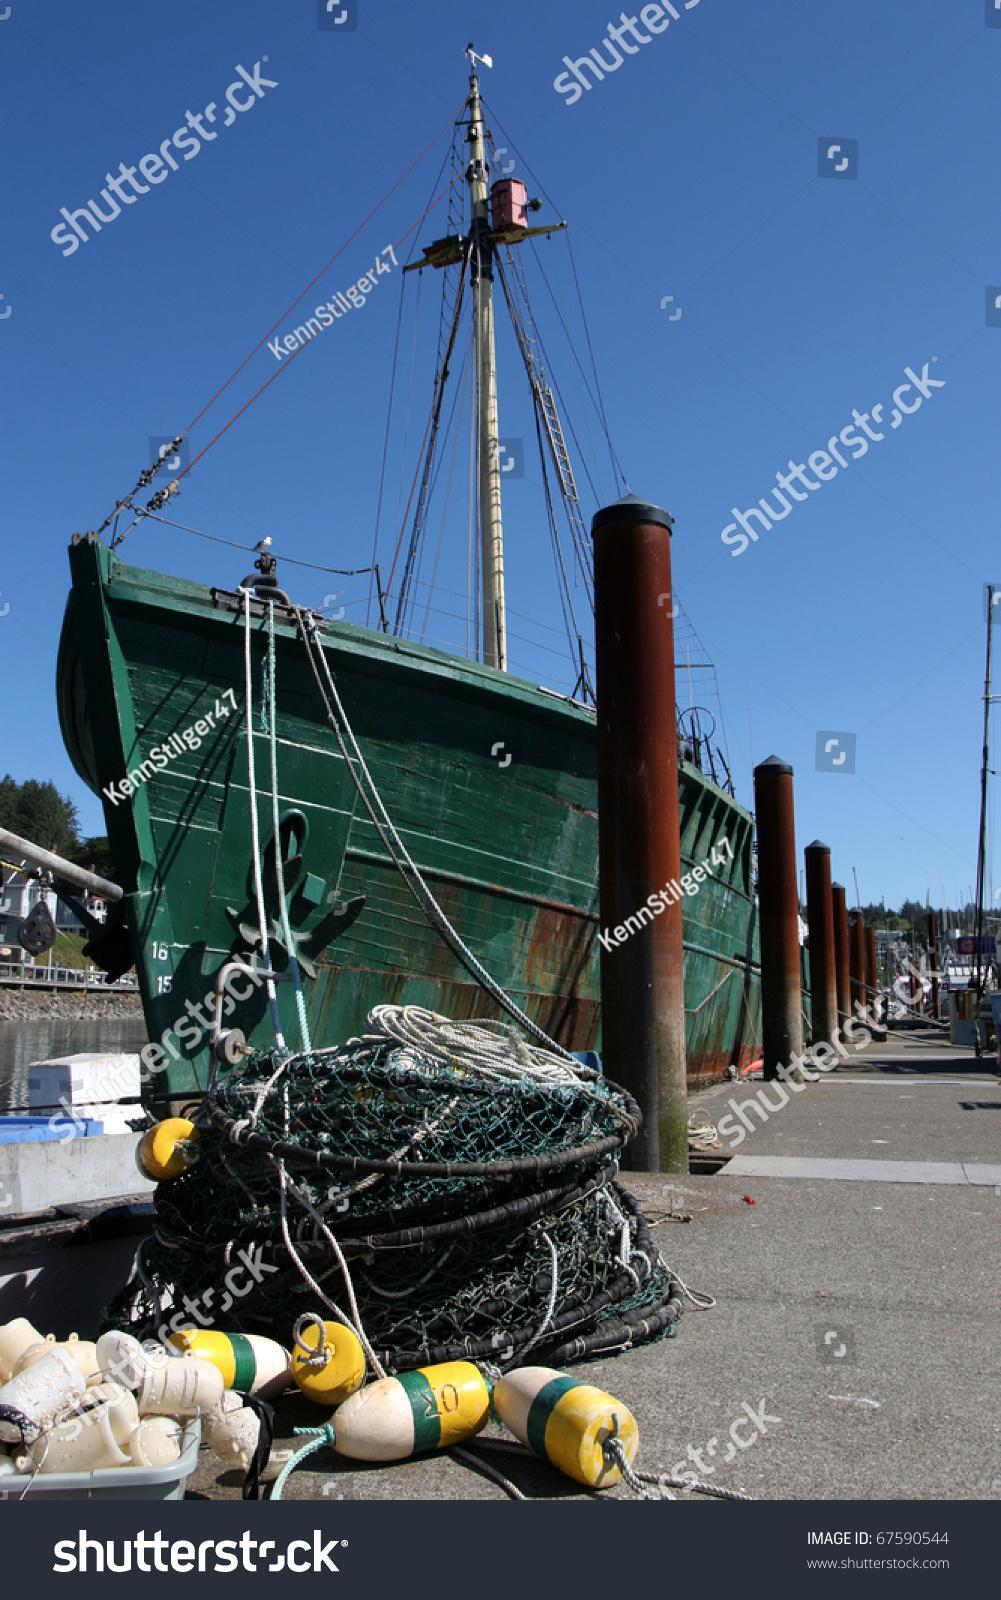 Oregon commercial fishing boats in newport harbor stock for Commercial fishing boats for sale in oregon